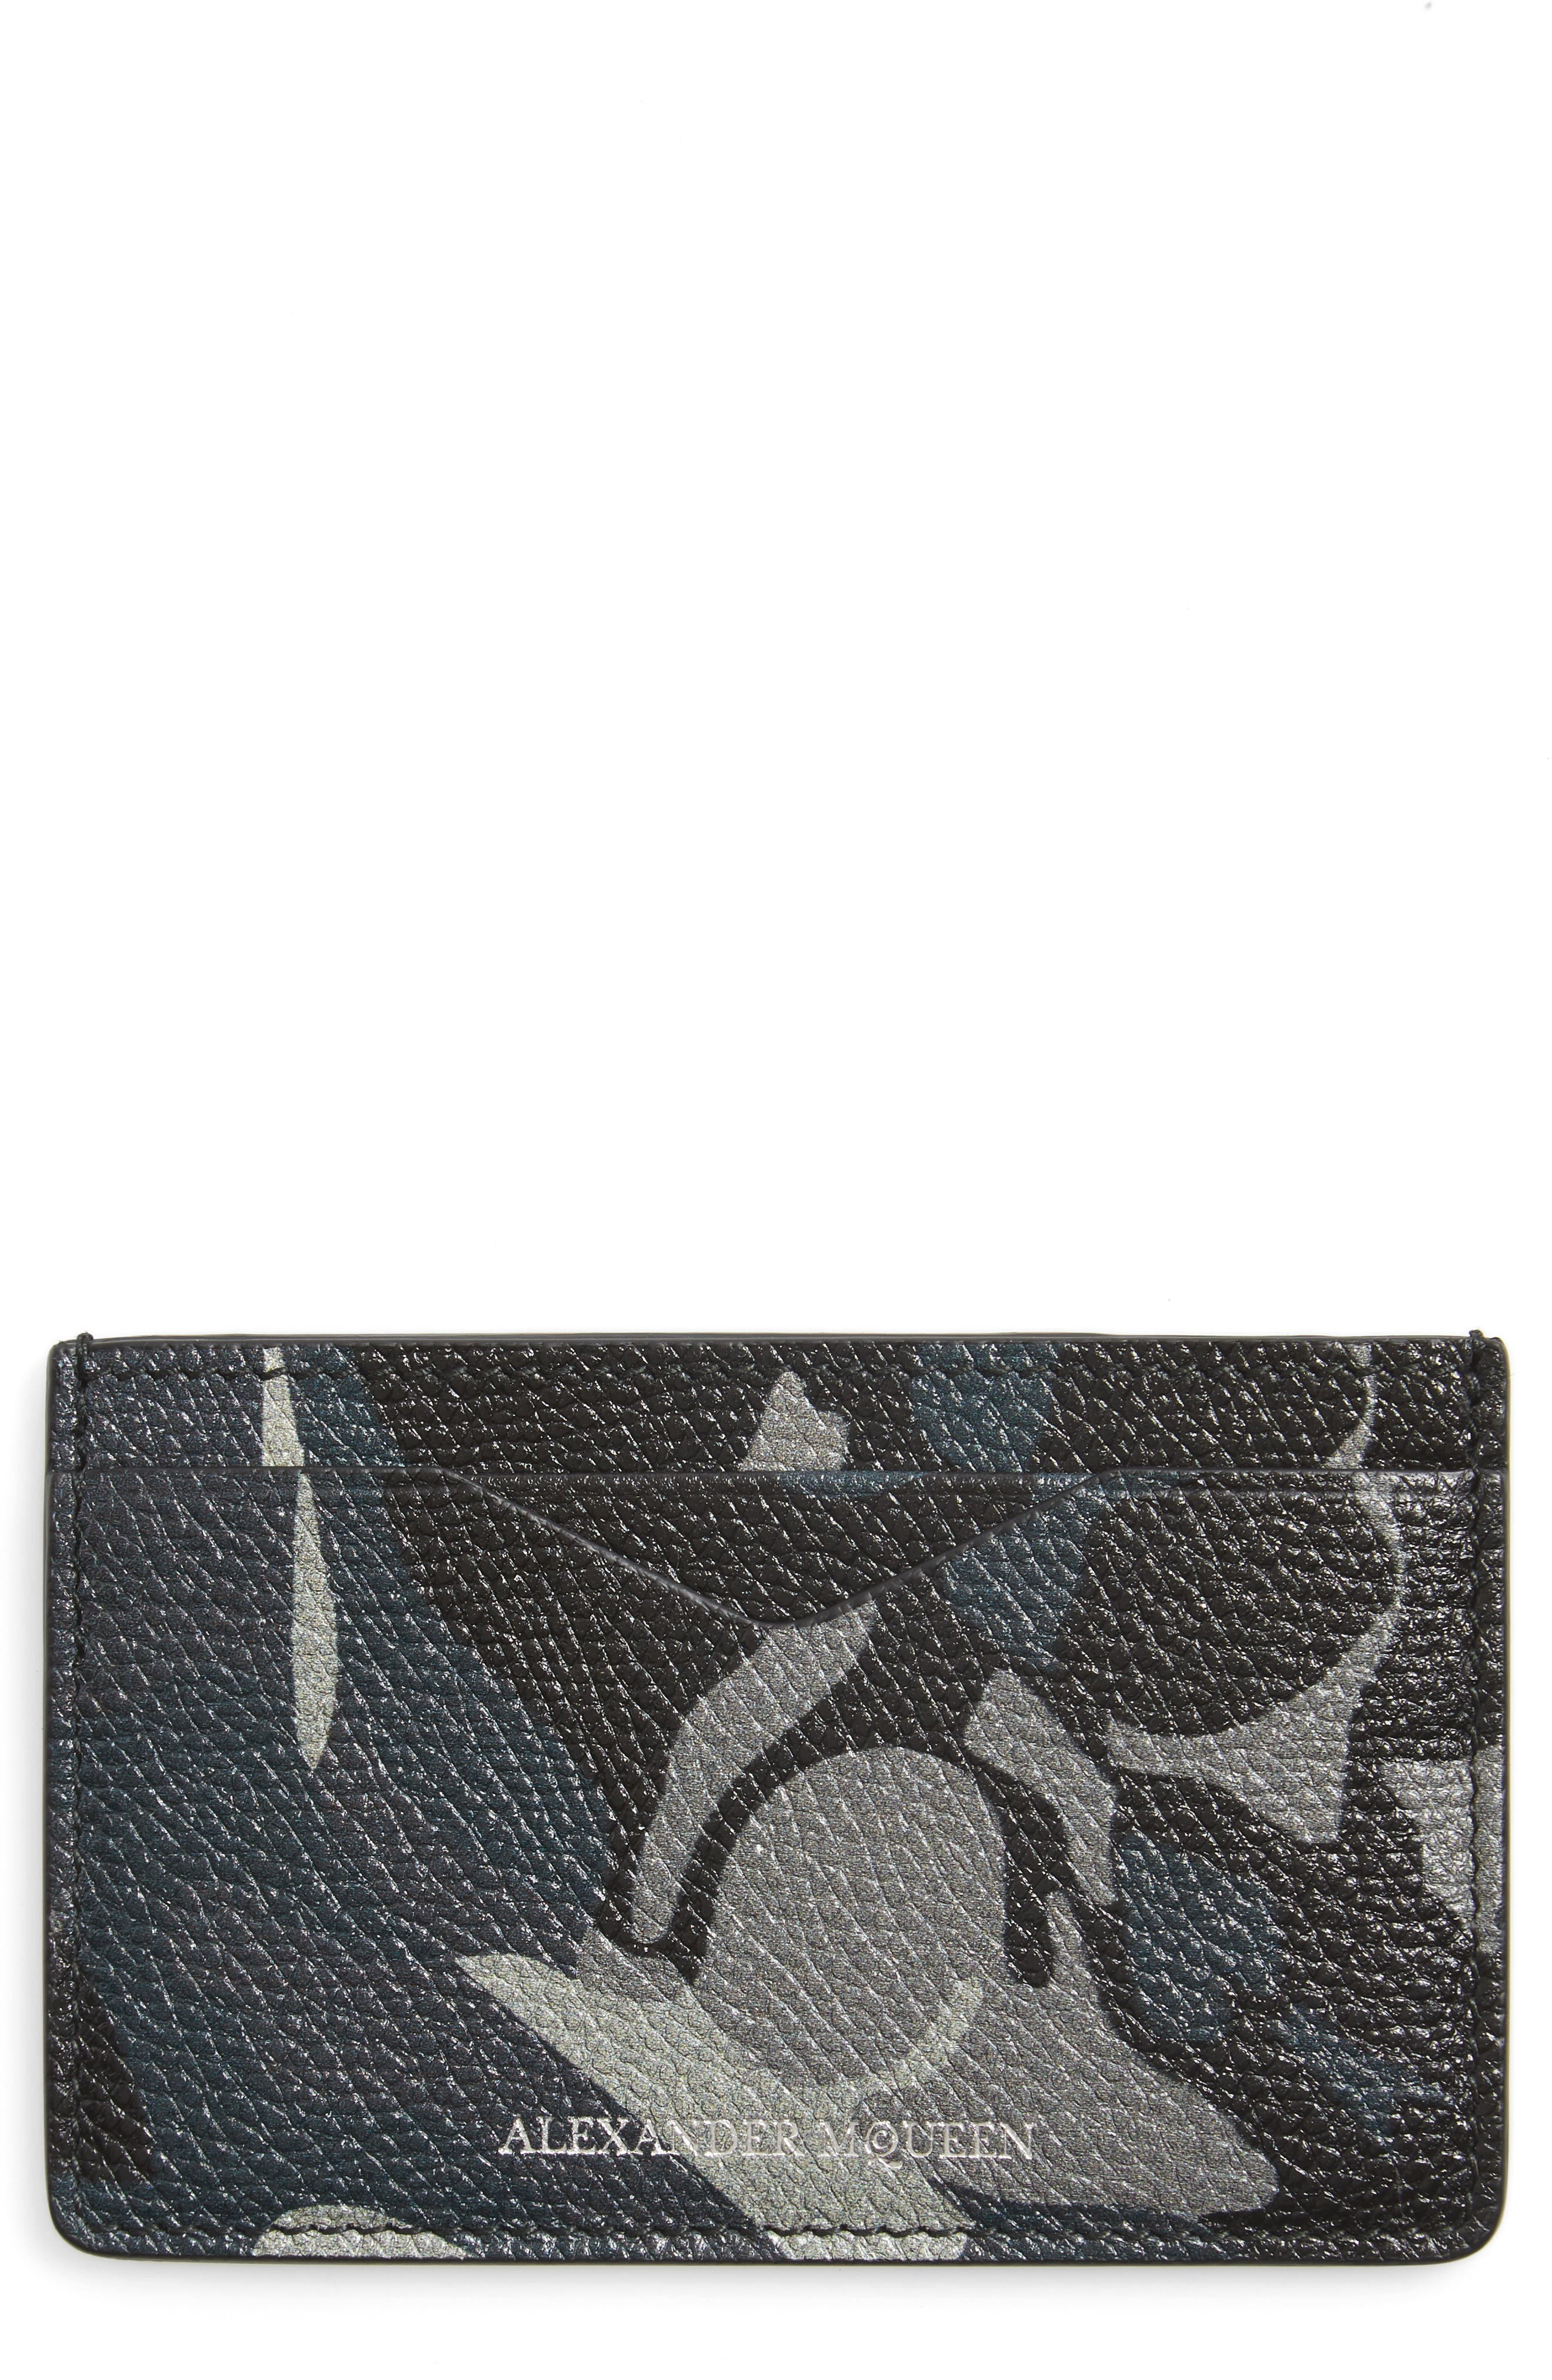 Main Image - Alexander McQueen Camo Leather Card Case